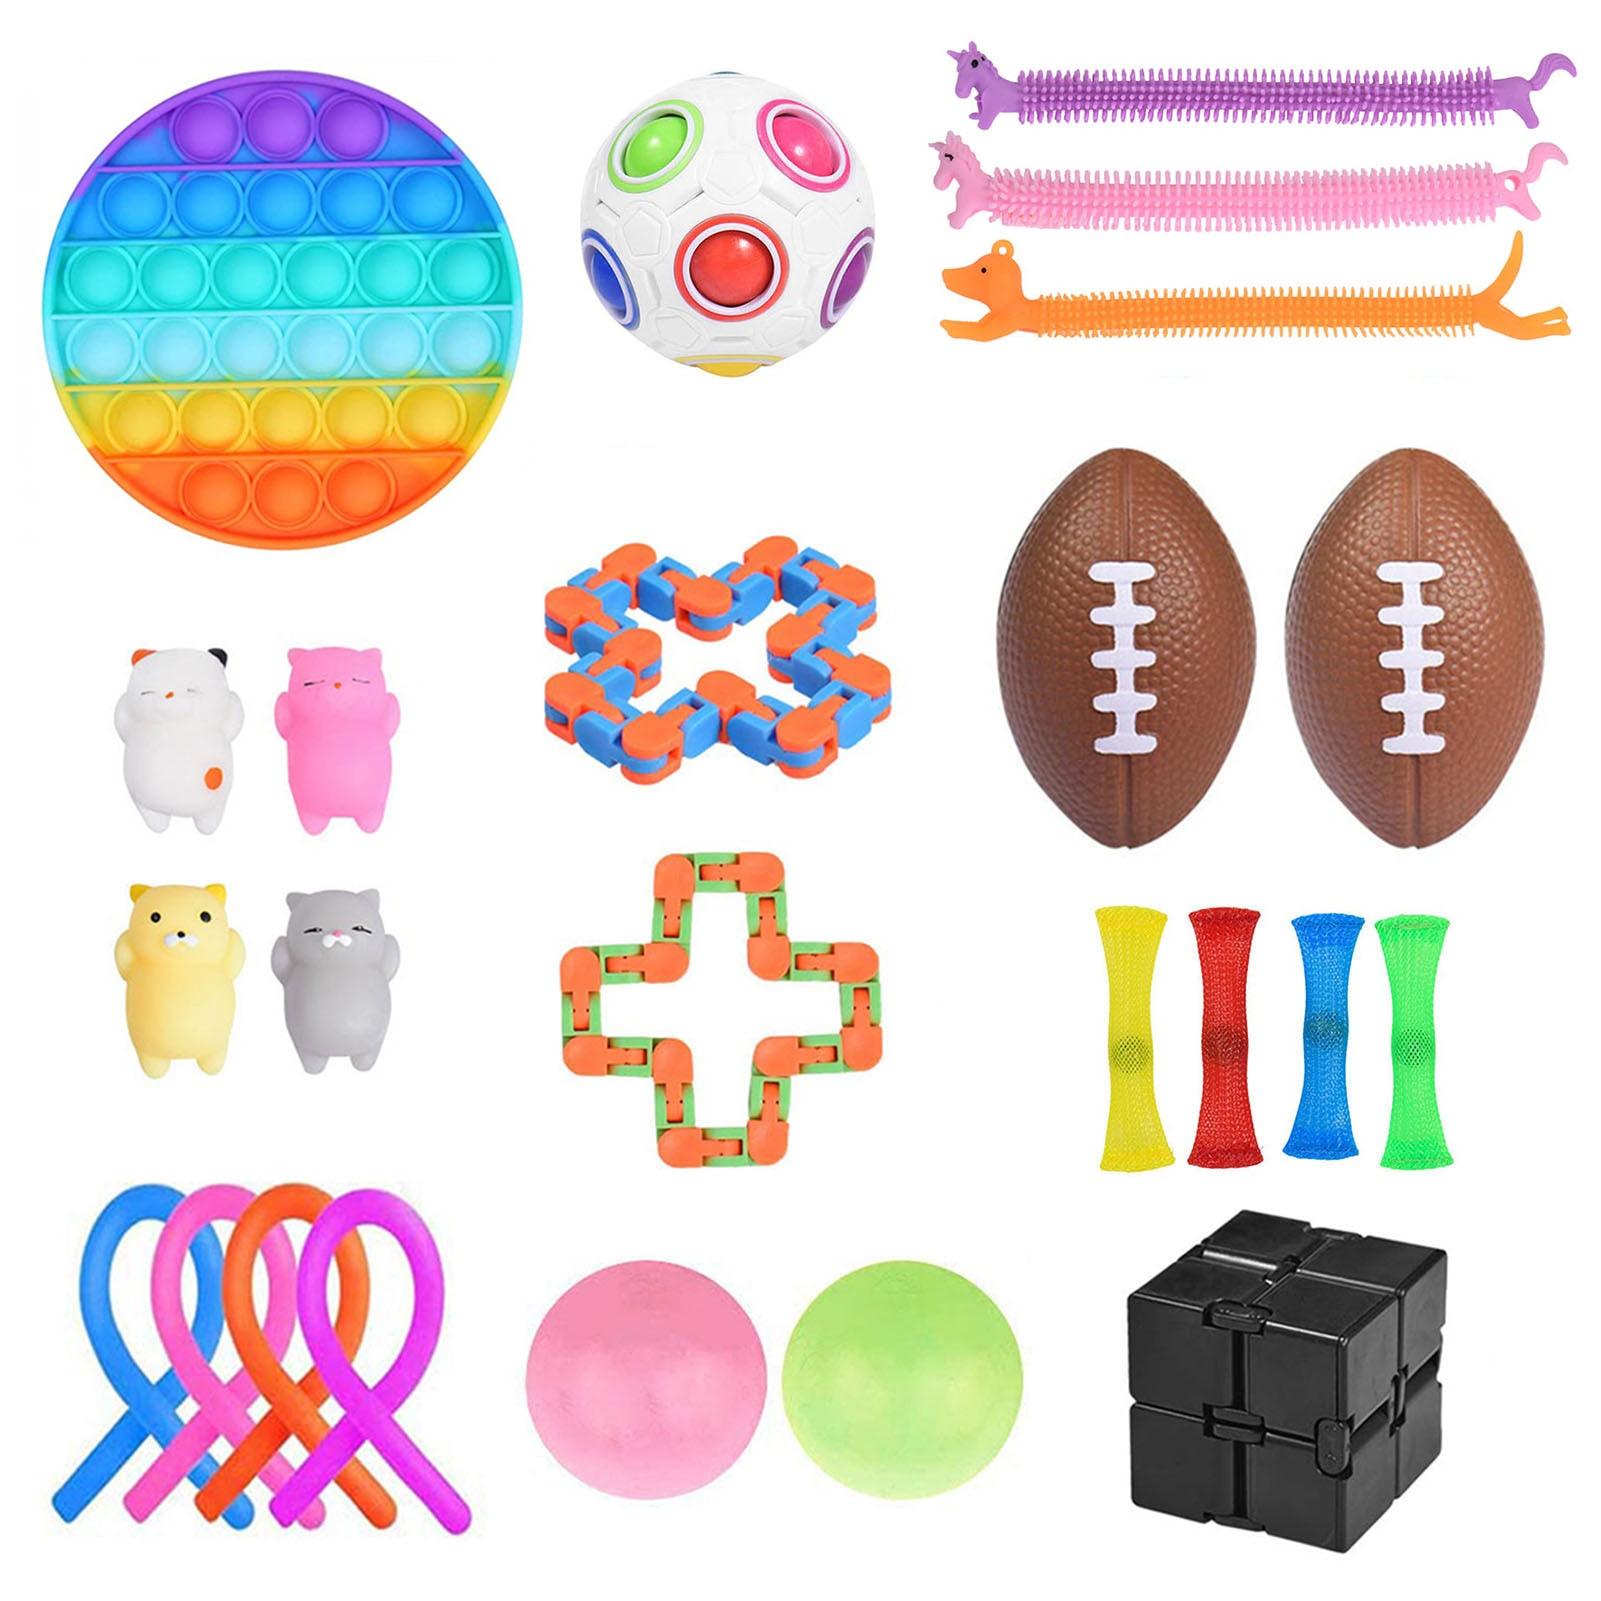 24PCS Bubble Sensory Fidget Toy Fidget Toys Sensory Anti Stress Toy Set Figet Antistress Relief Stress Relief Anti-Anxiety Toys enlarge